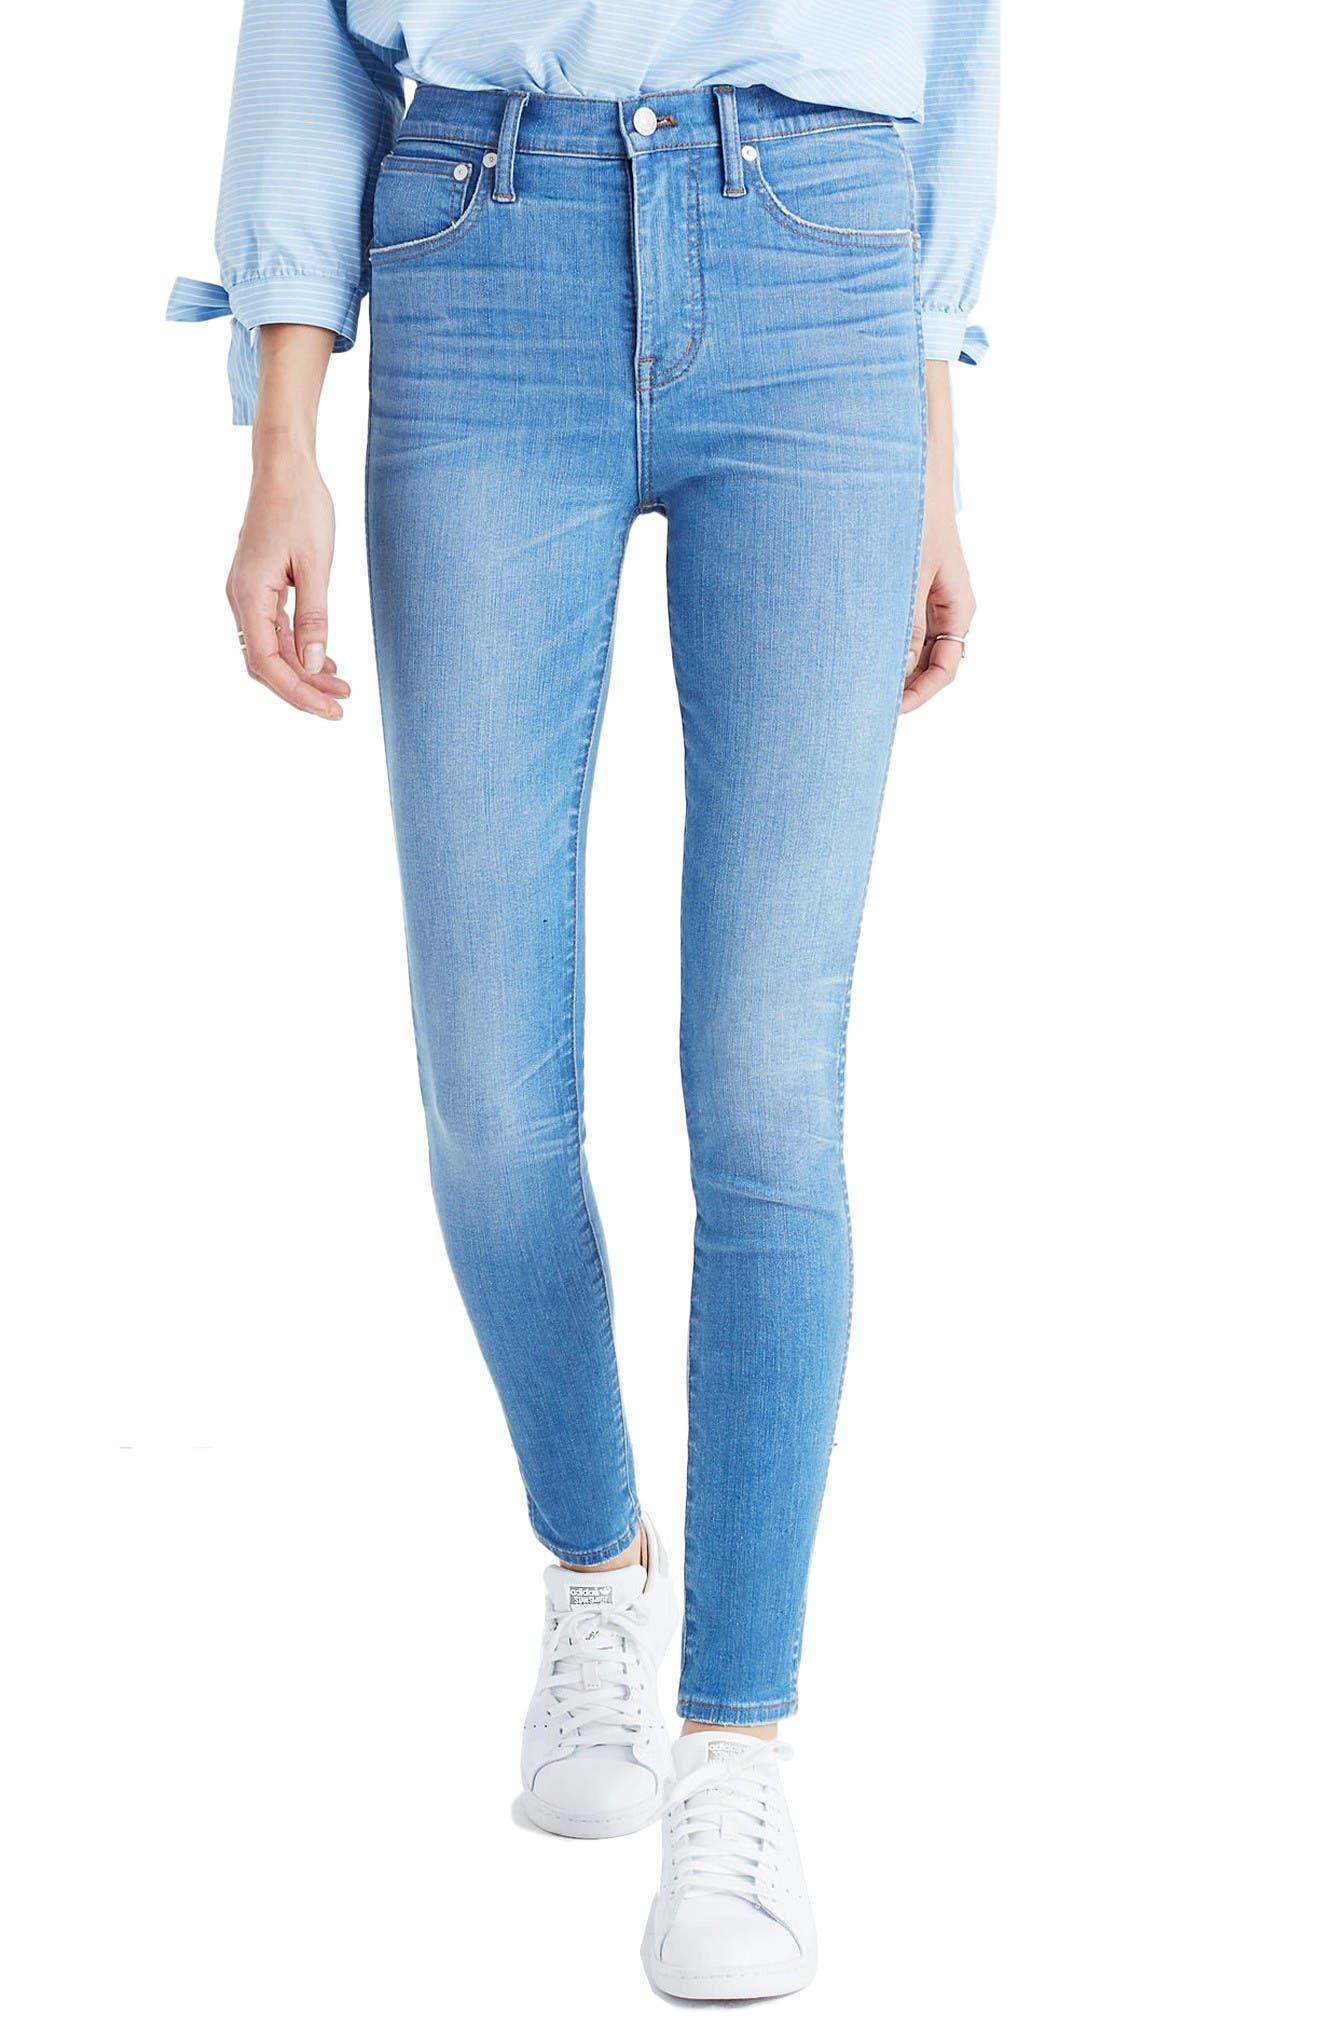 Main Image - Madewell High Rise Skinny Jeans (Hank Wash)